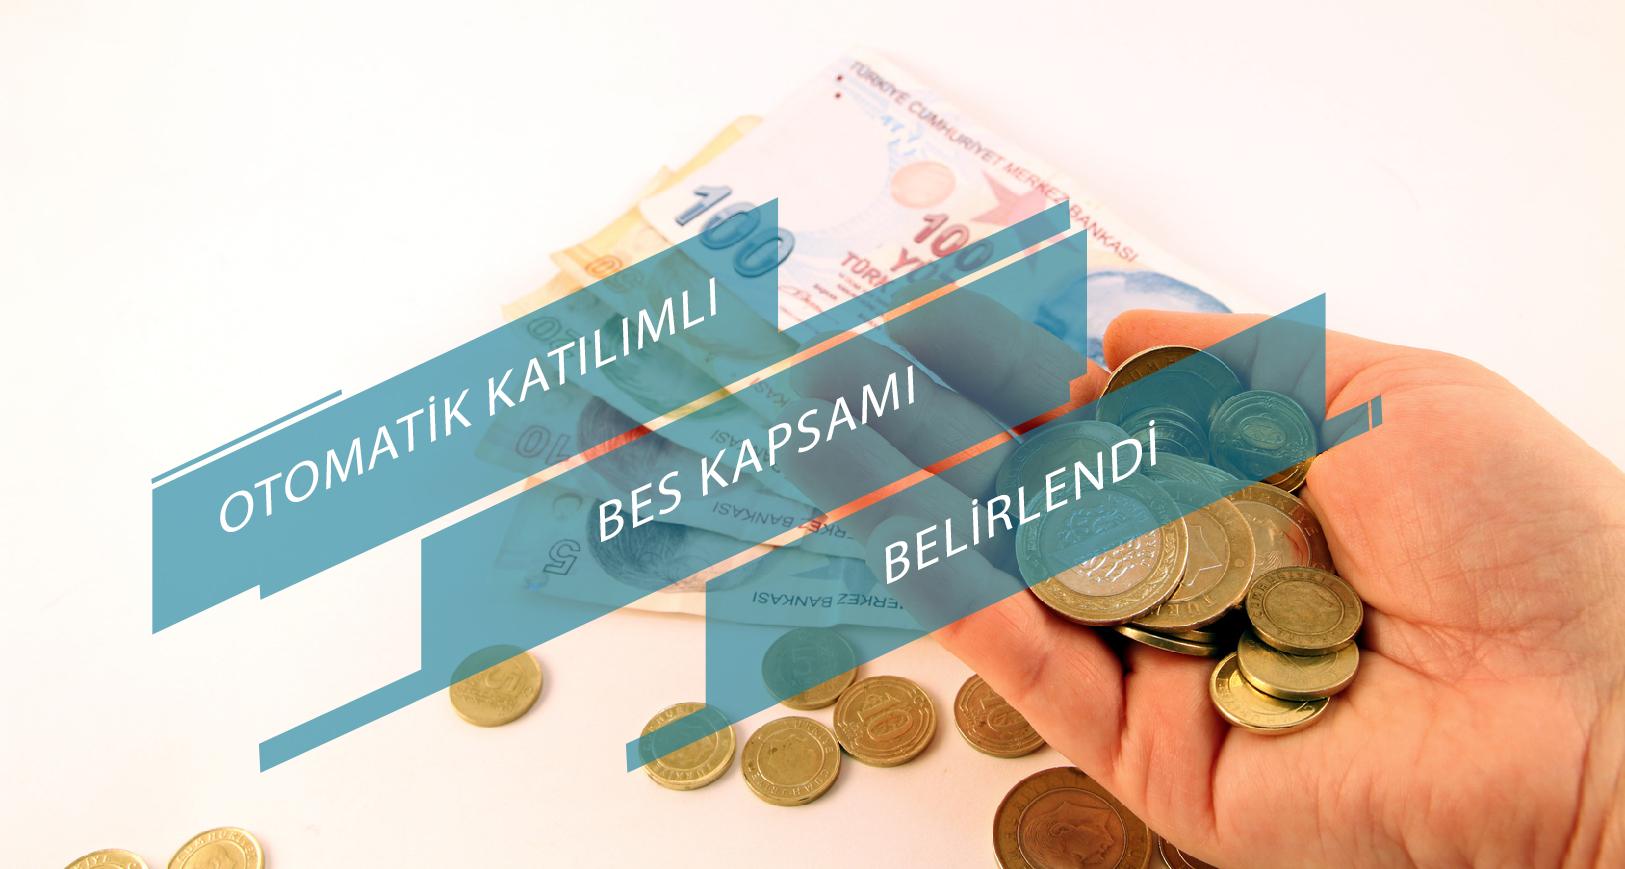 OTOMATİK KATILIMLI BES KAPSAMI BELİRLENDİ